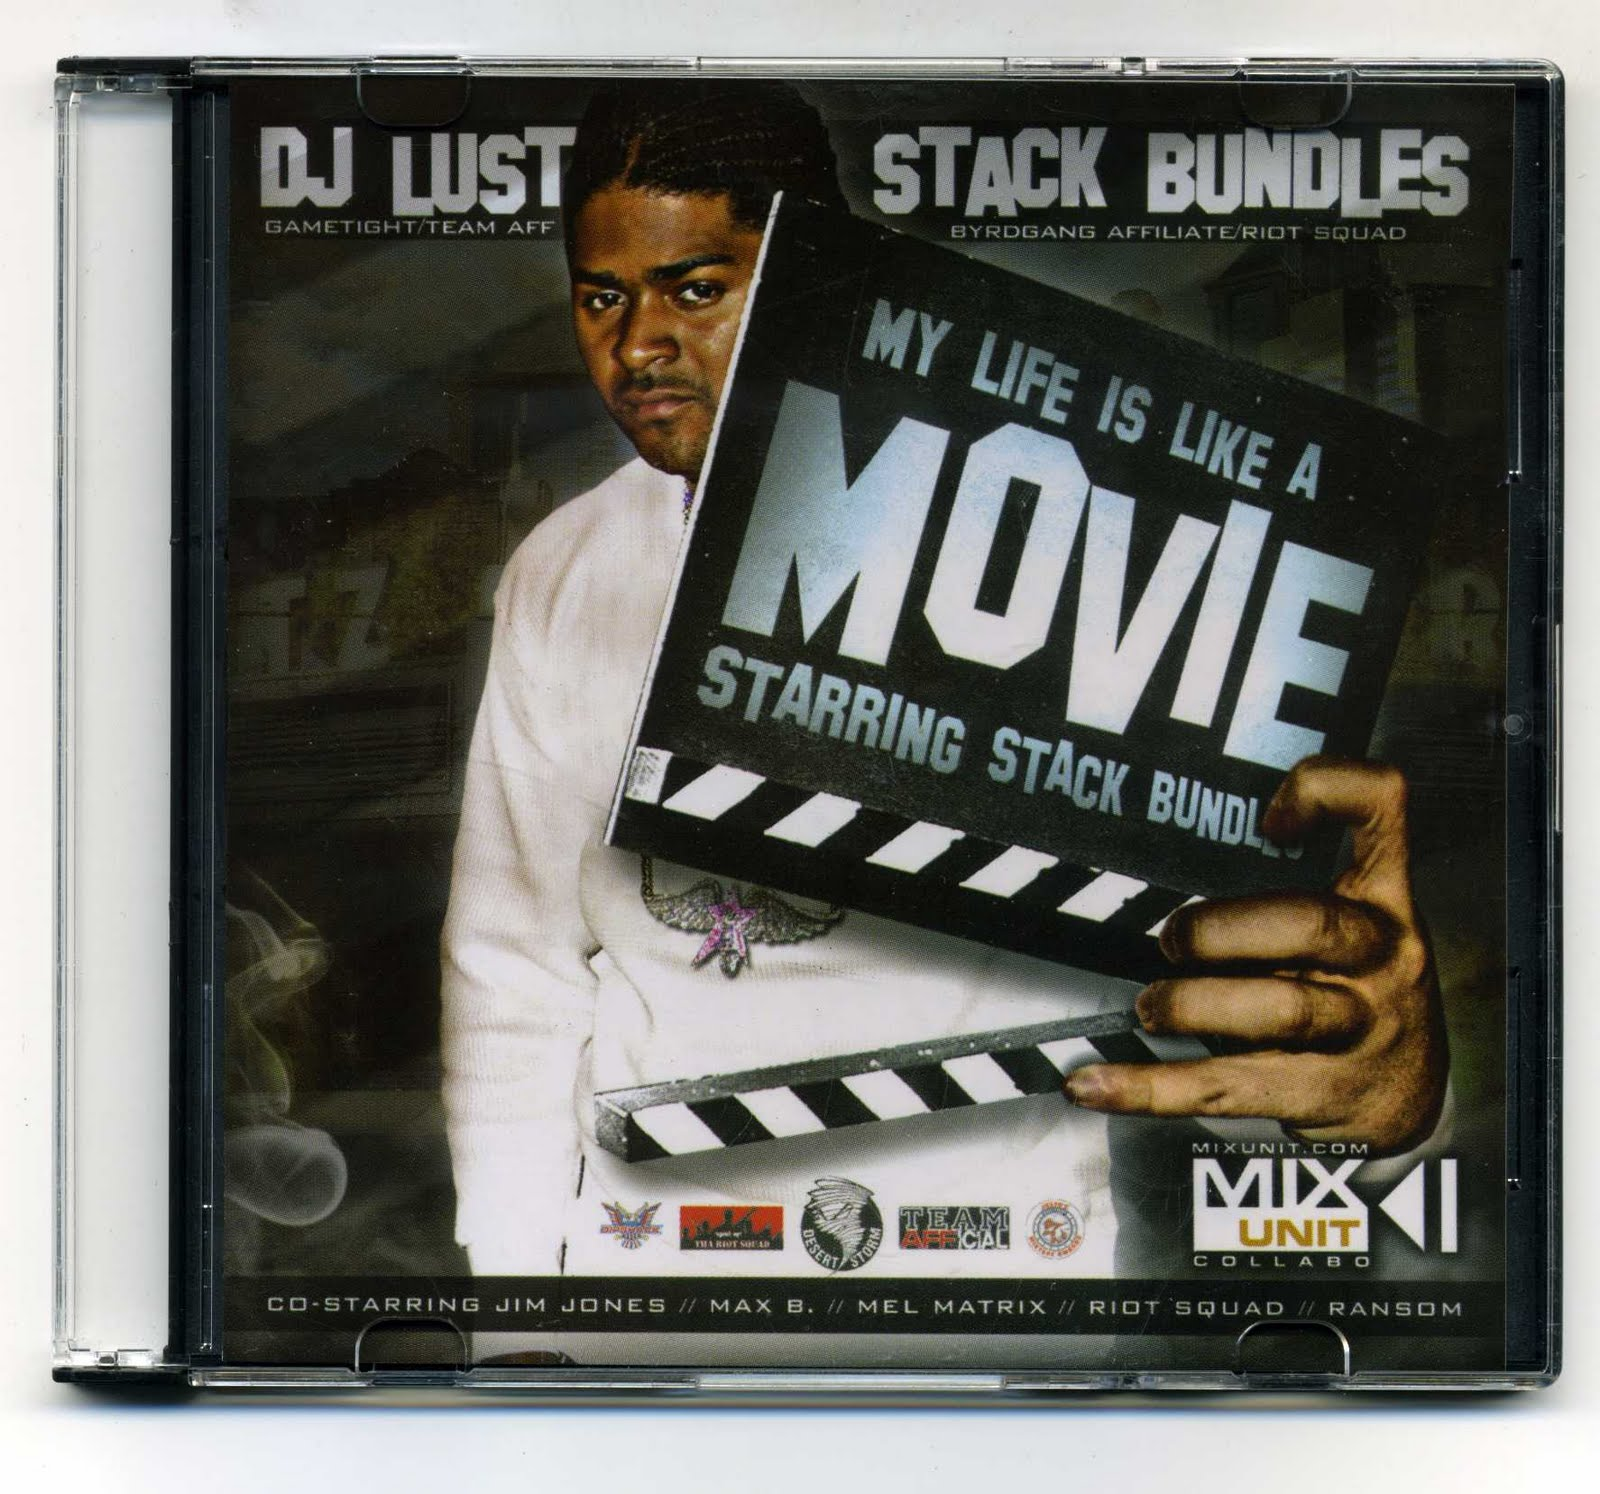 http://4.bp.blogspot.com/-gOdR15Qr8pw/Td99tVapaJI/AAAAAAAANGc/lnfP-RQitqM/s1600/00-dj_lust_and_stack_bundles-my_lifes_like_a_movie-1-2006-c4.jpg